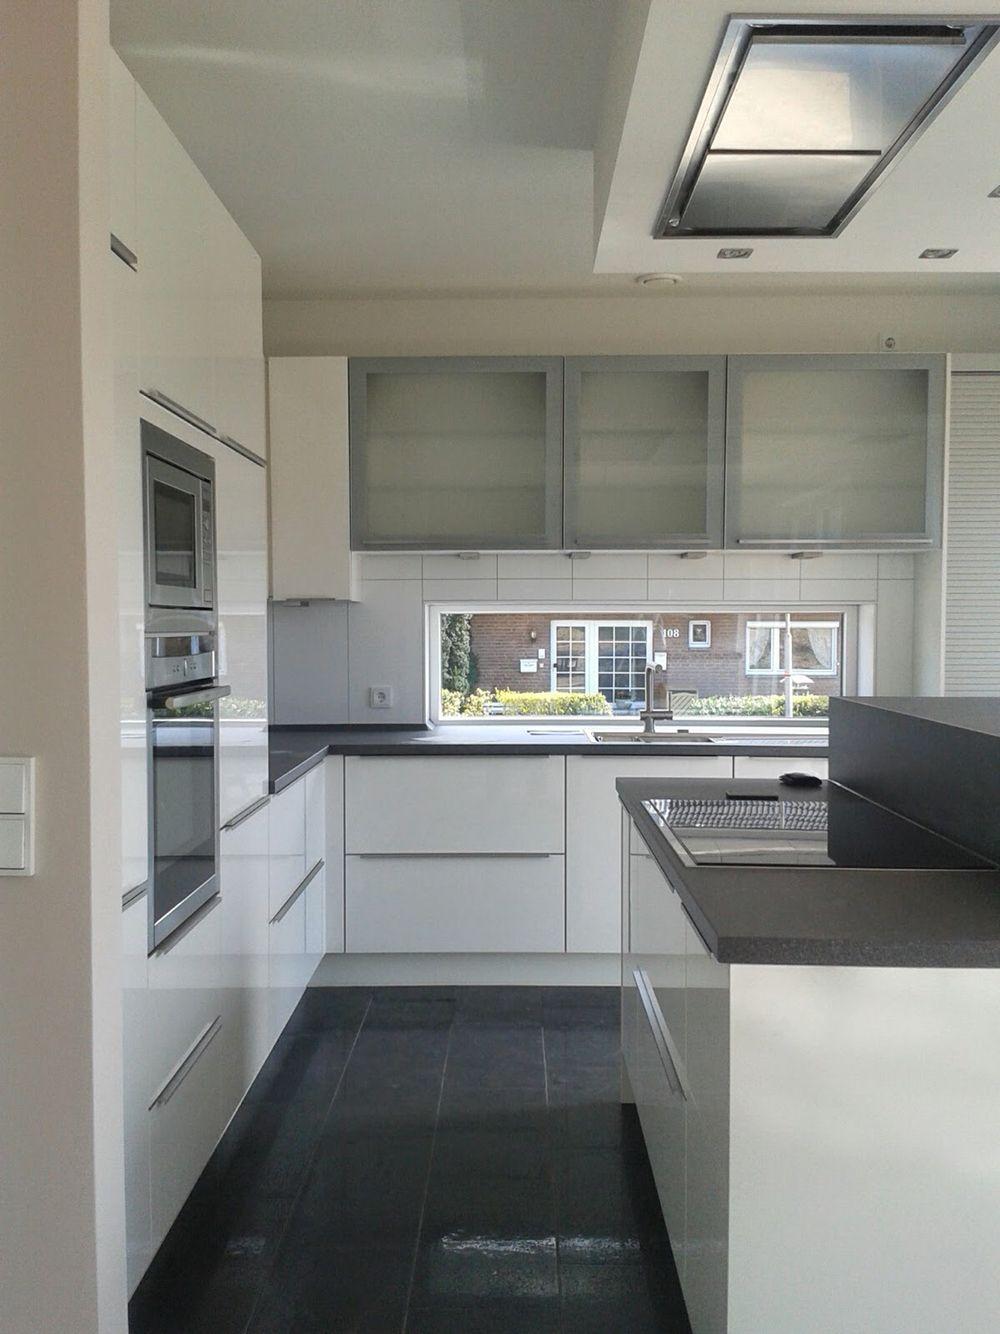 ber ideen zu graue k cheninsel auf pinterest graue k chen graue k chen und kochinseln. Black Bedroom Furniture Sets. Home Design Ideas